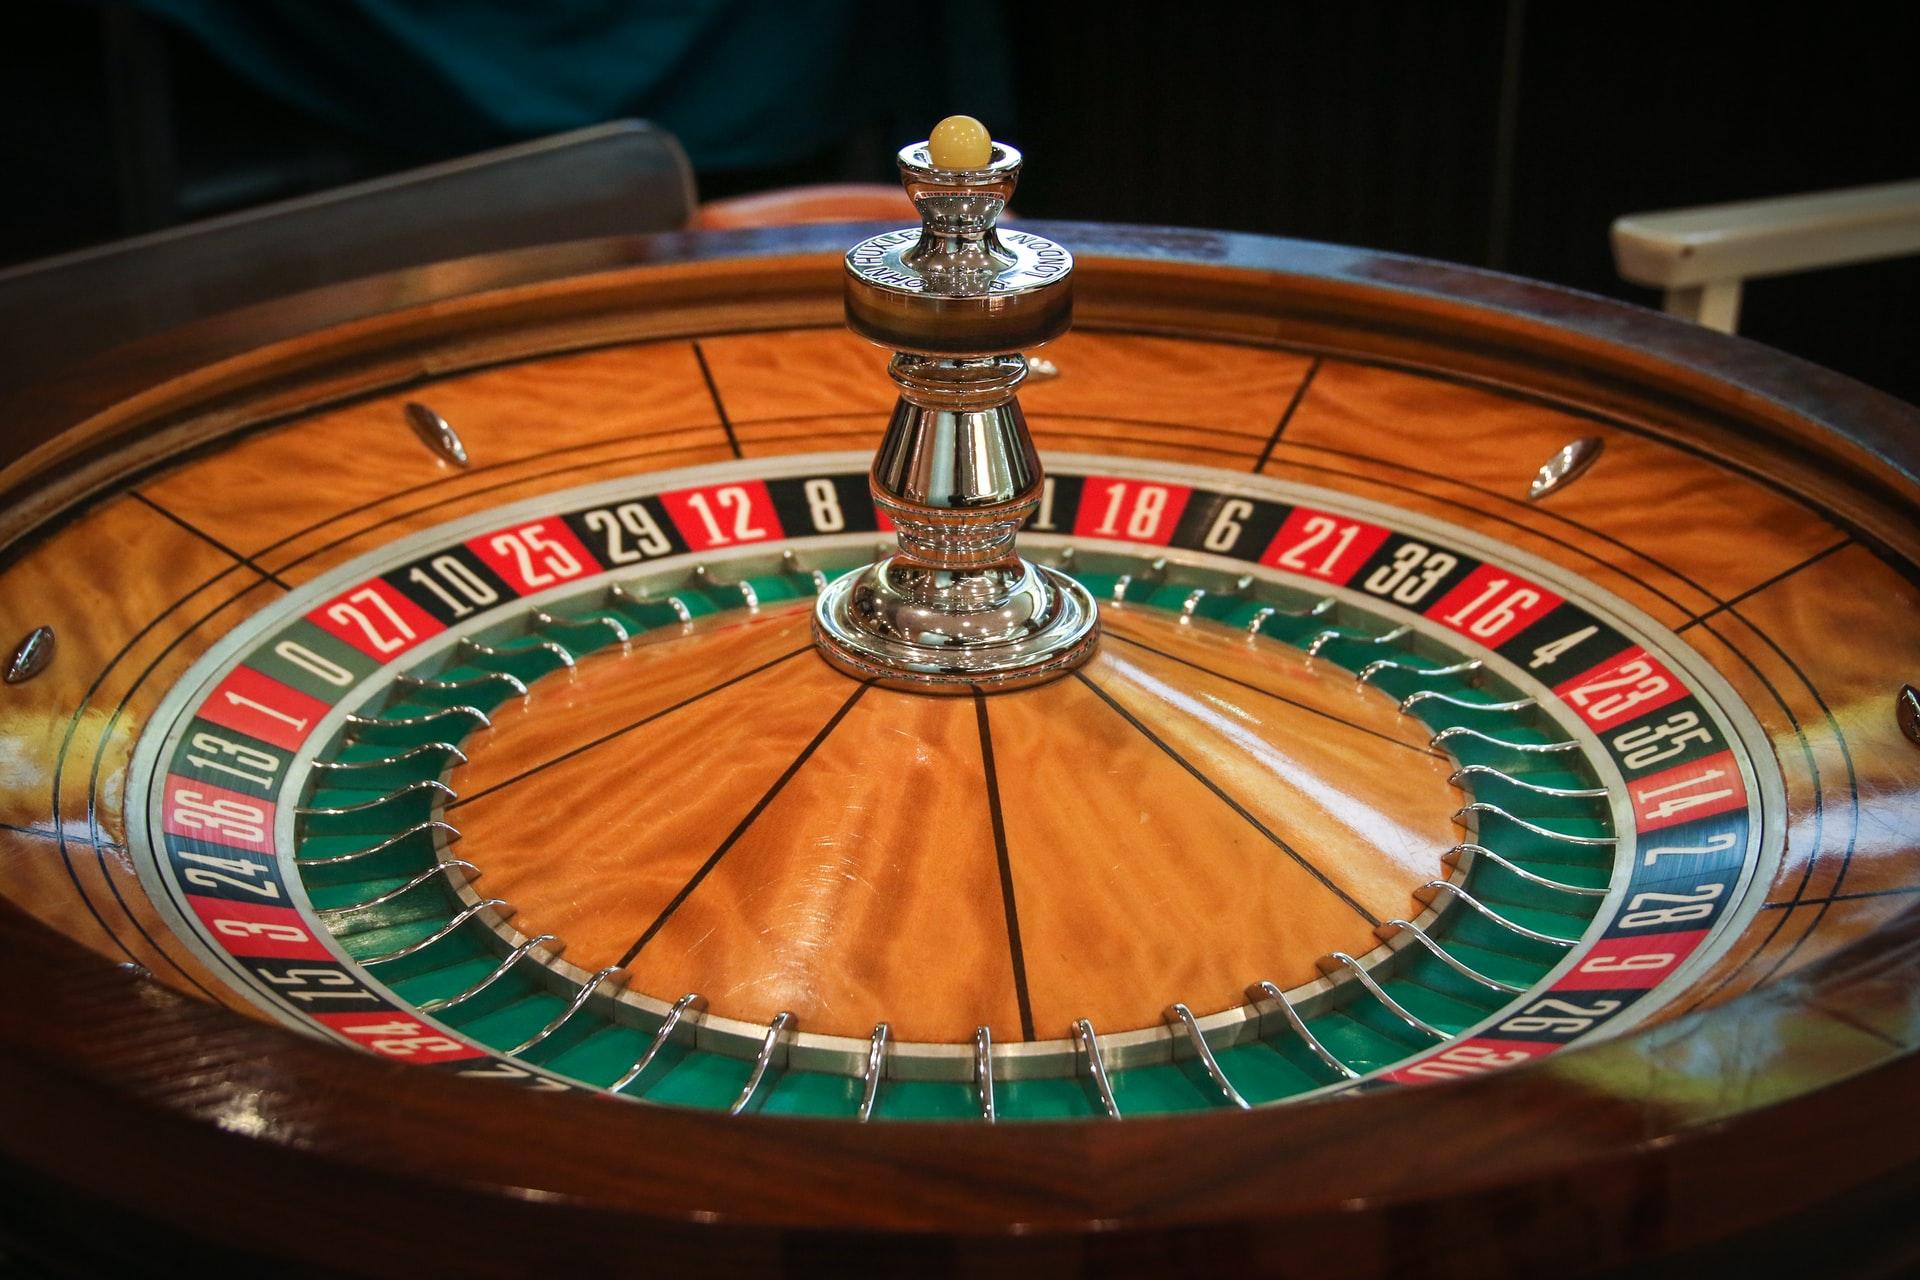 Lincoln casino no deposit free spins